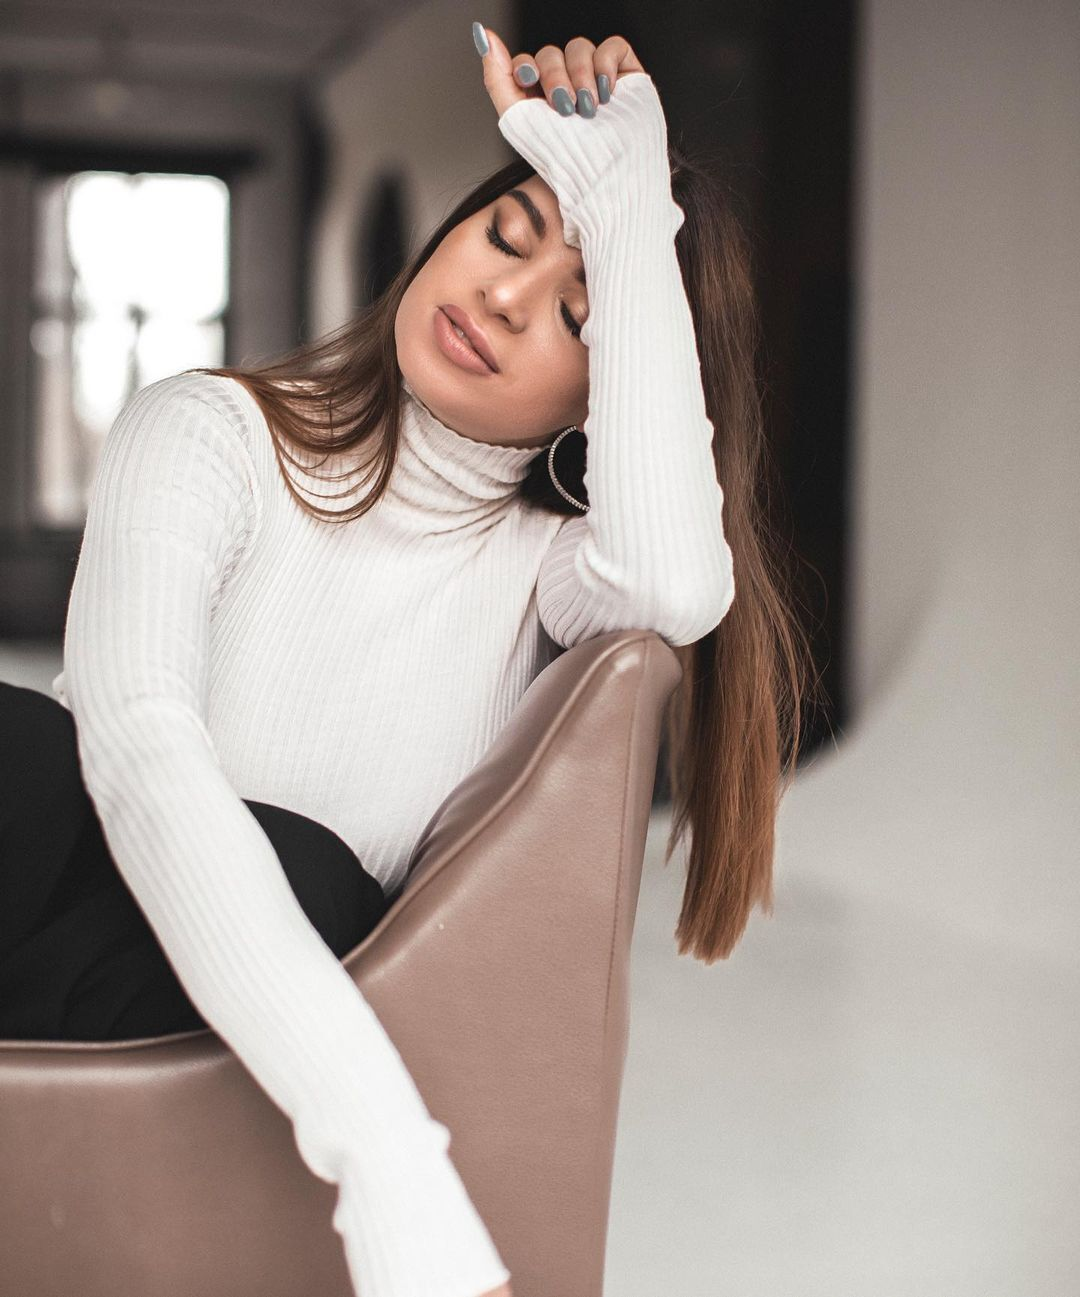 Екатерина Хмелевская на стуле